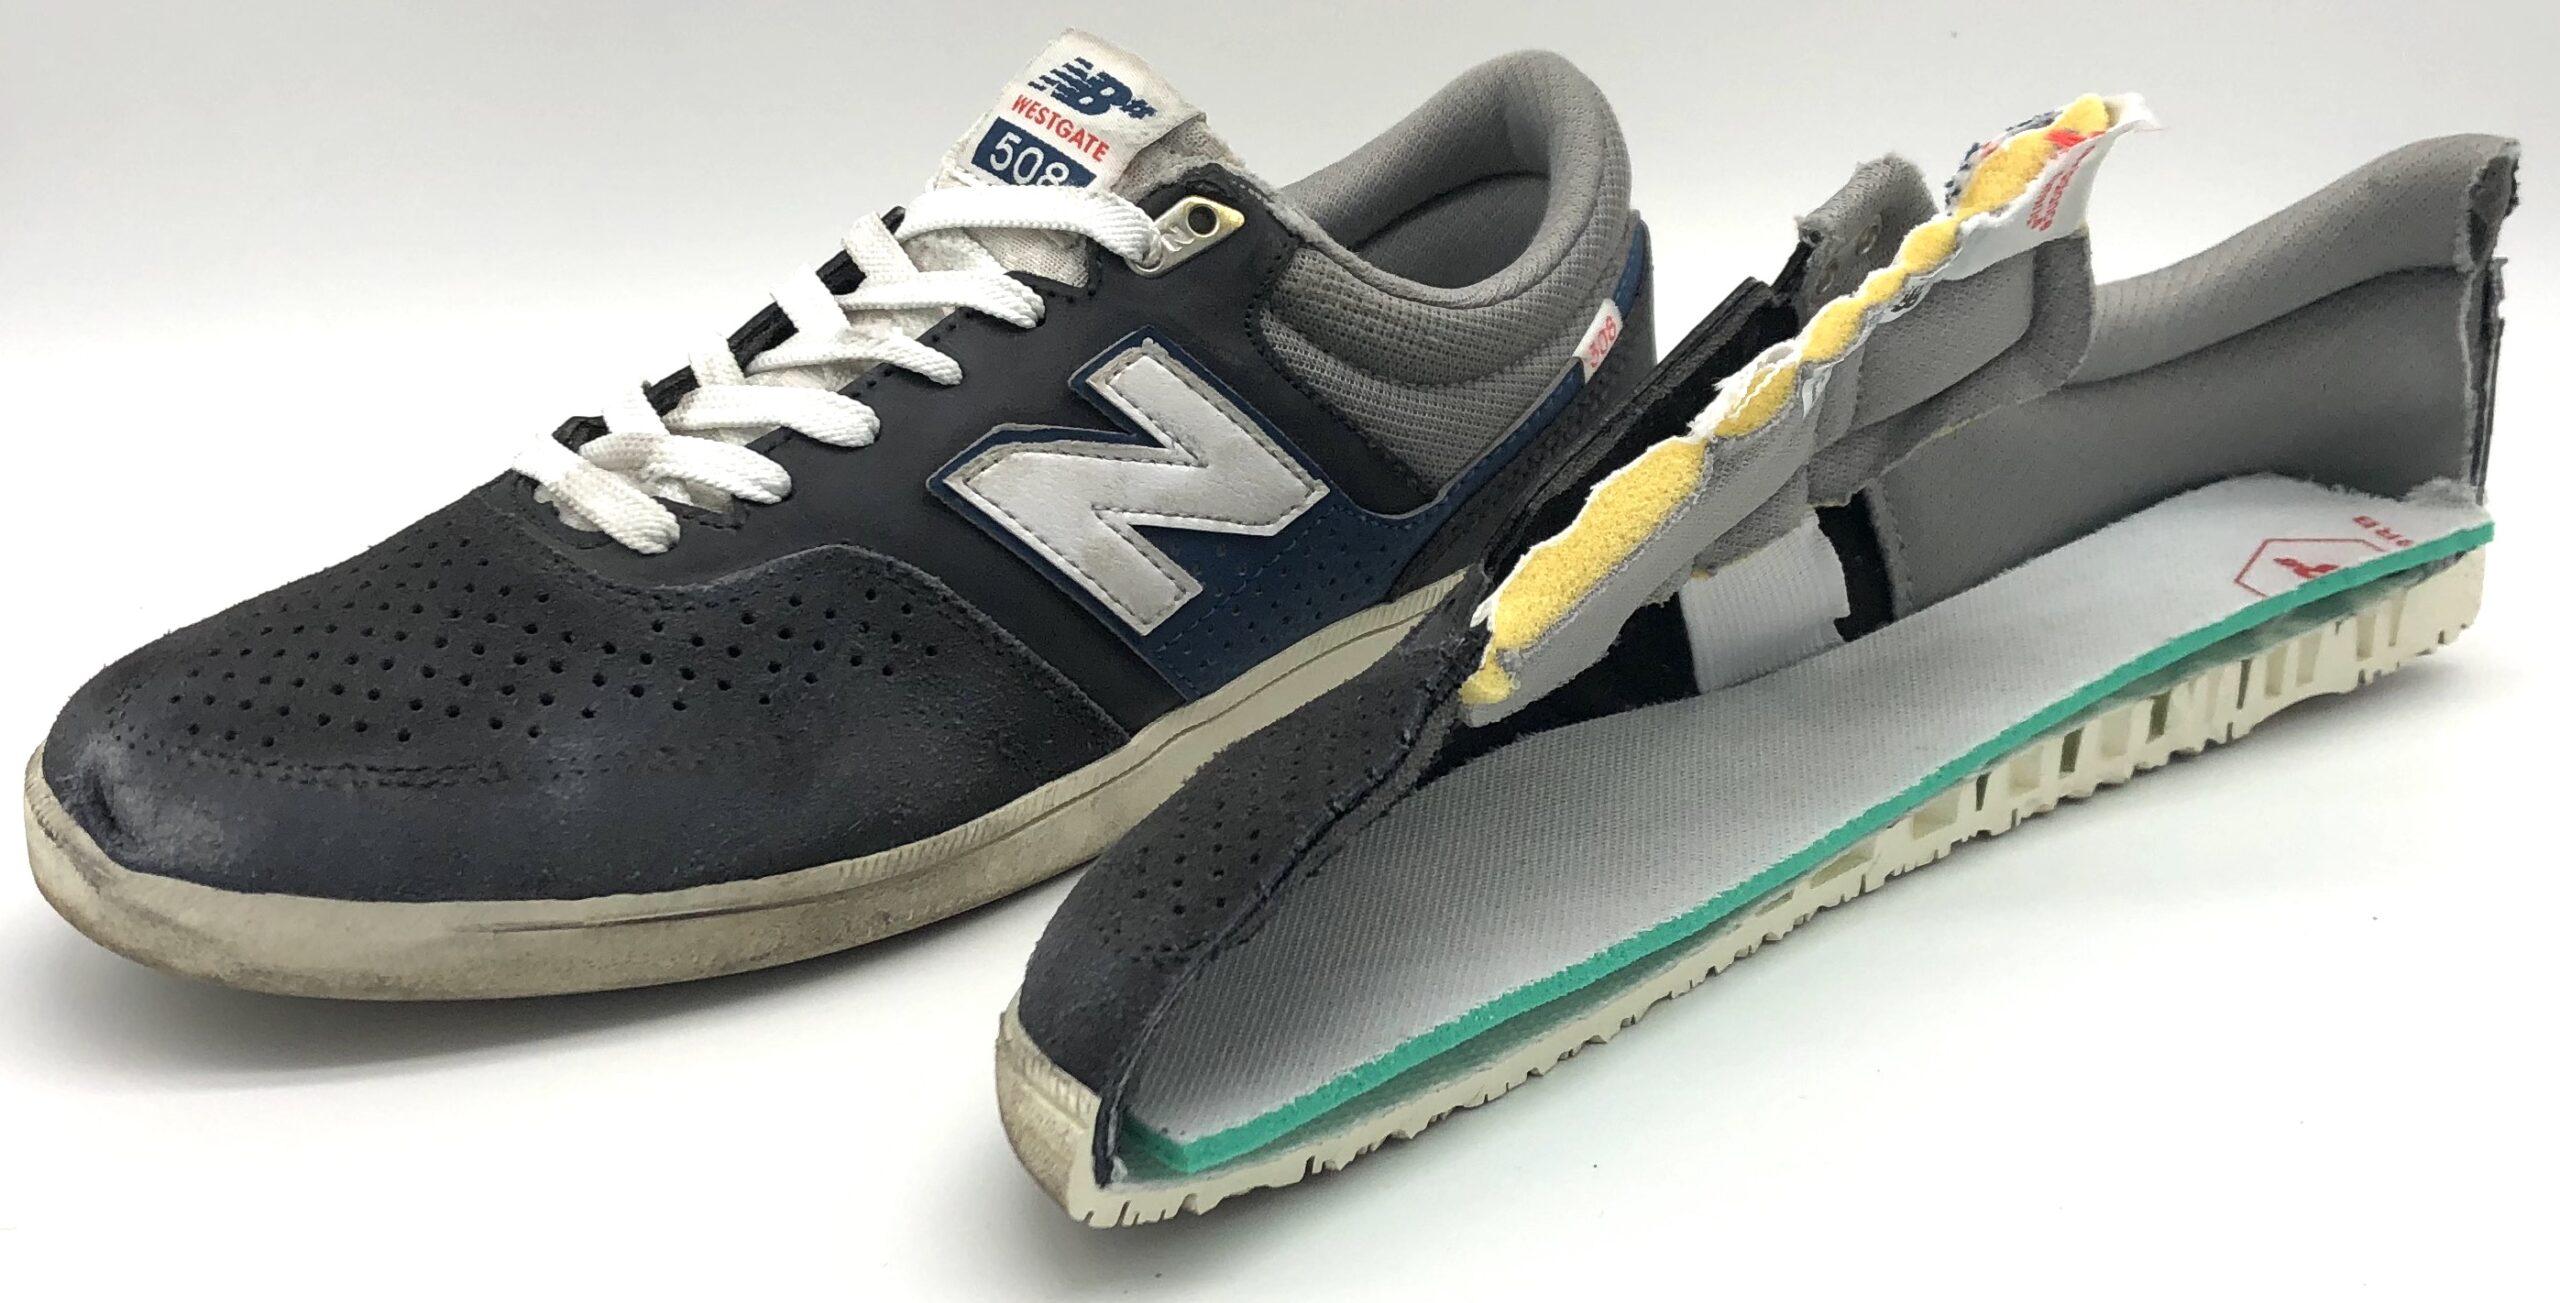 NB# Westgate 508 - Weartested - detailed skate shoe reviews